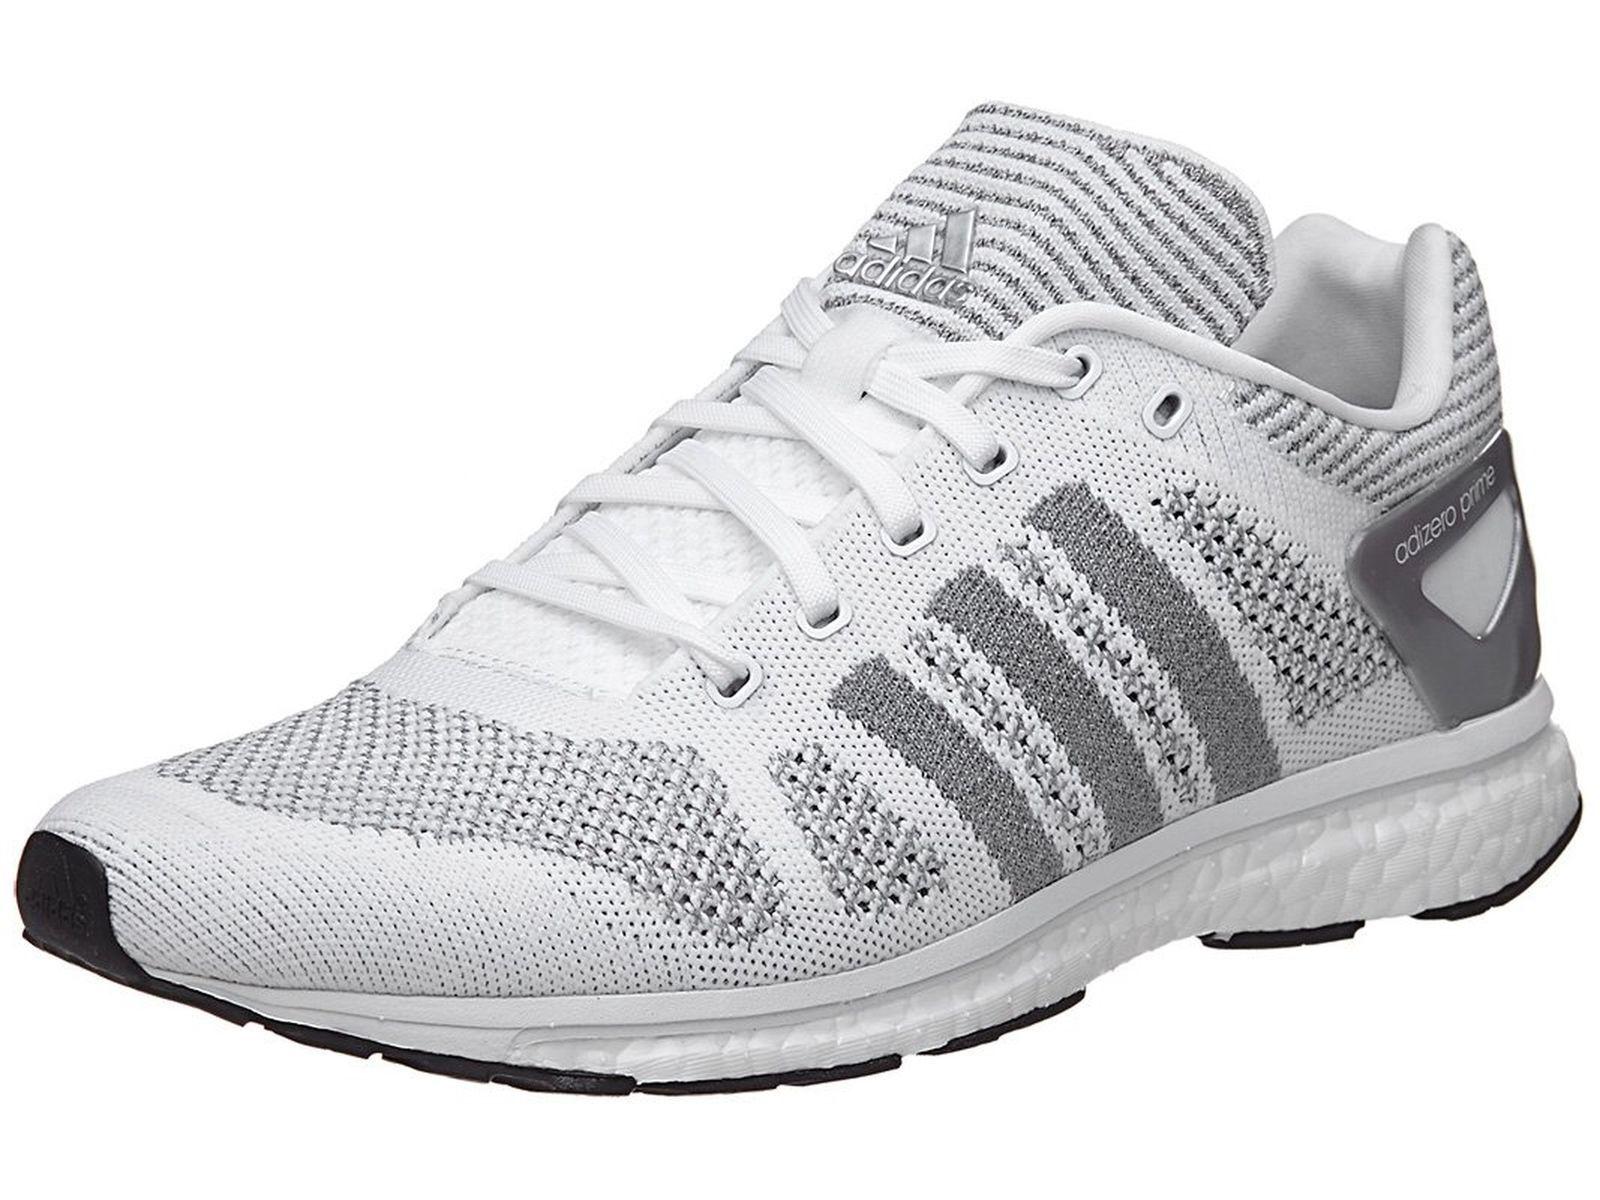 Adidas adizero Prime LTD Unisex Running Shoes White / Grey Sz 8 BB4919